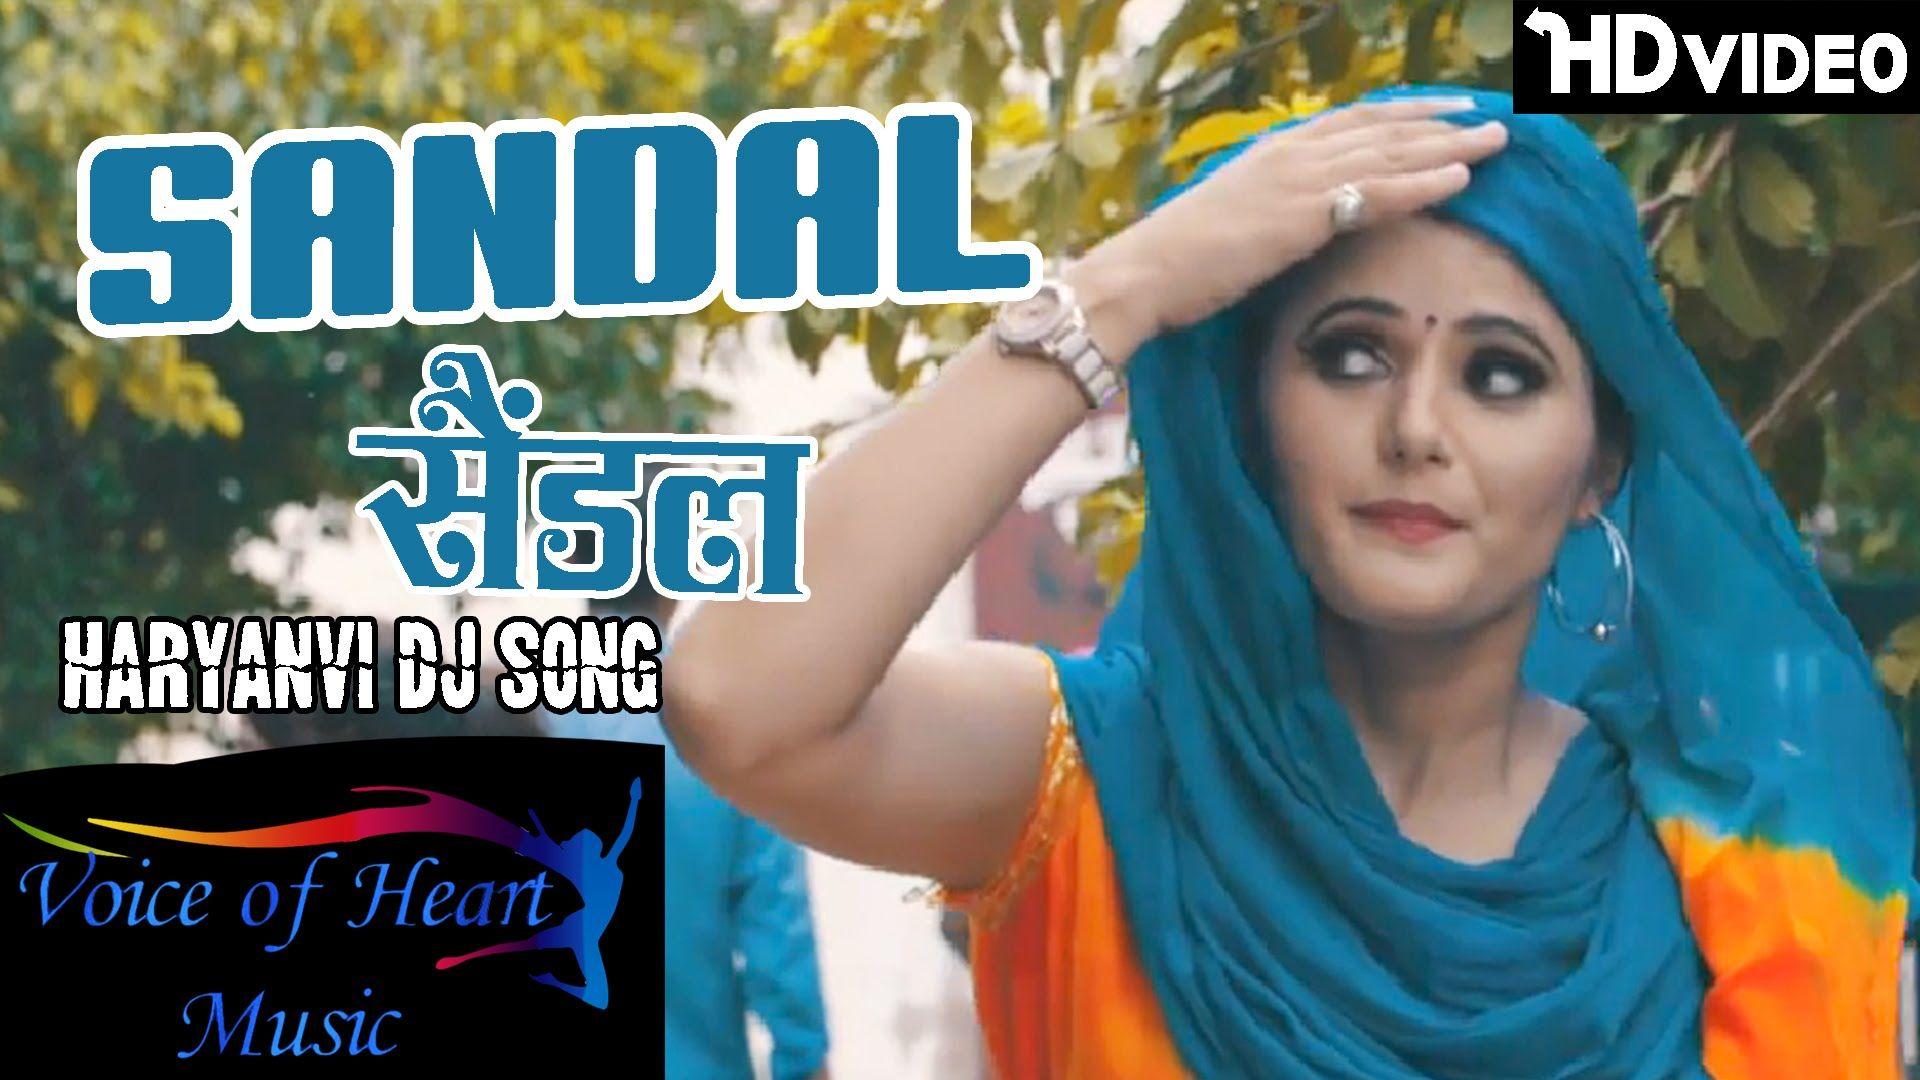 Haryanvi video song download dj